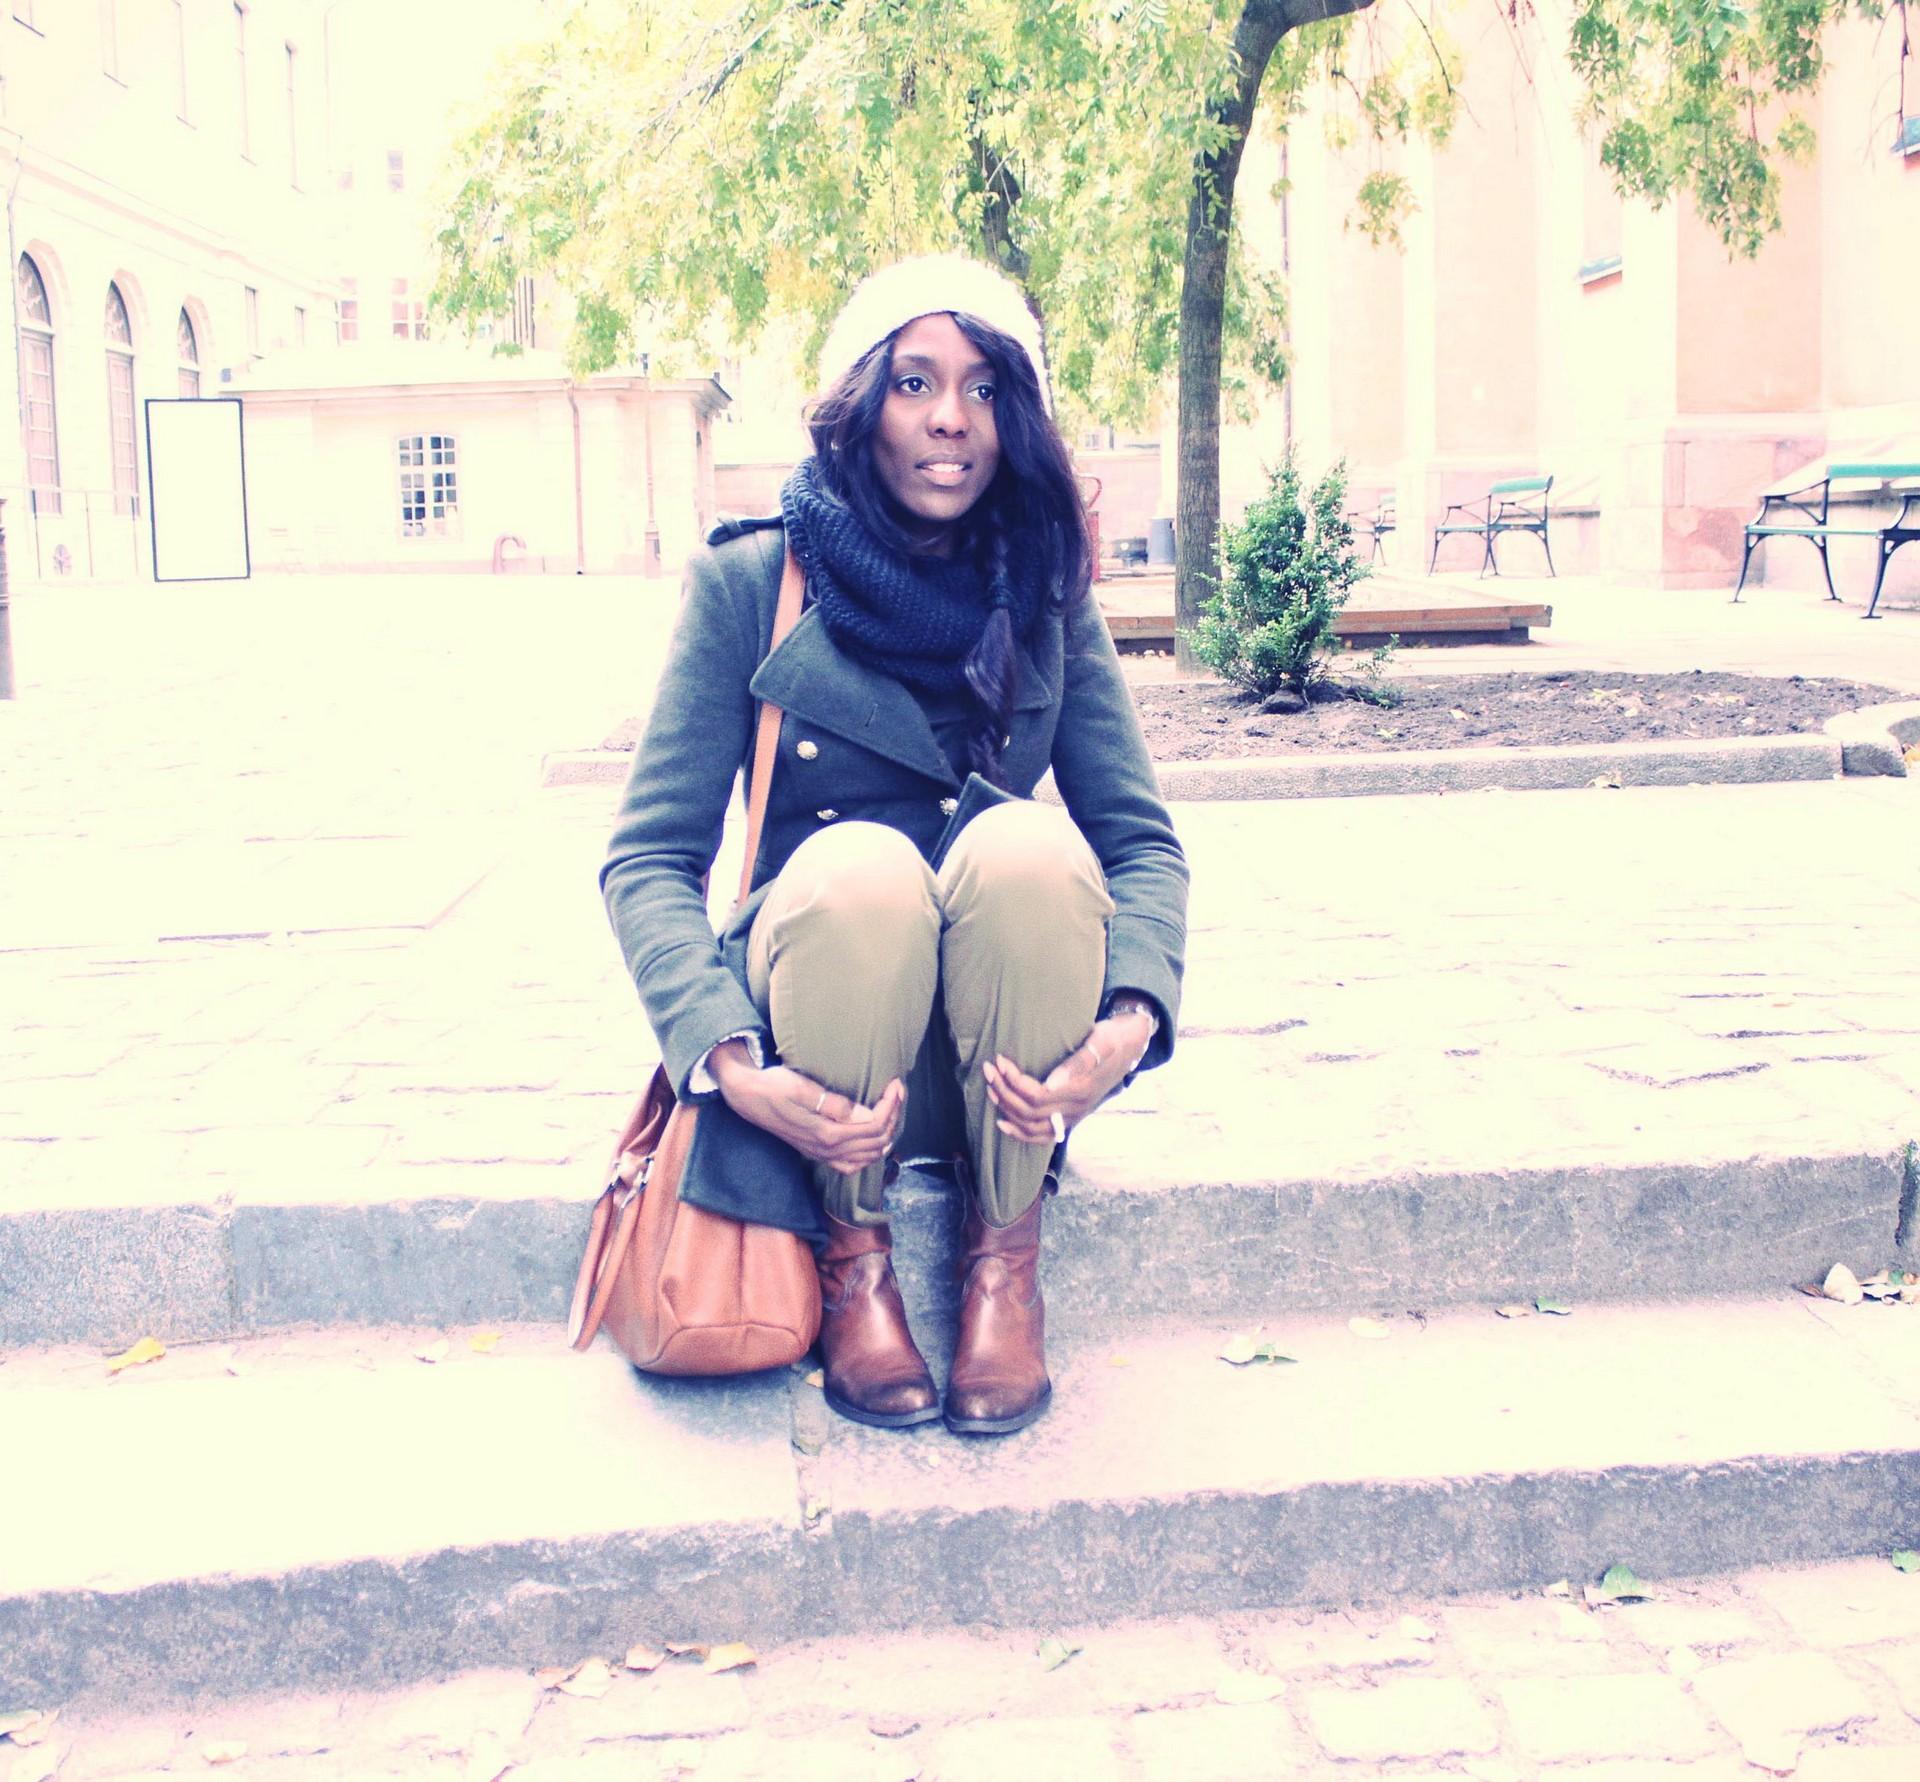 nunaavane-fashion-blogger-stockholm-europe-trip-outfit-casual-wear-ctbb6